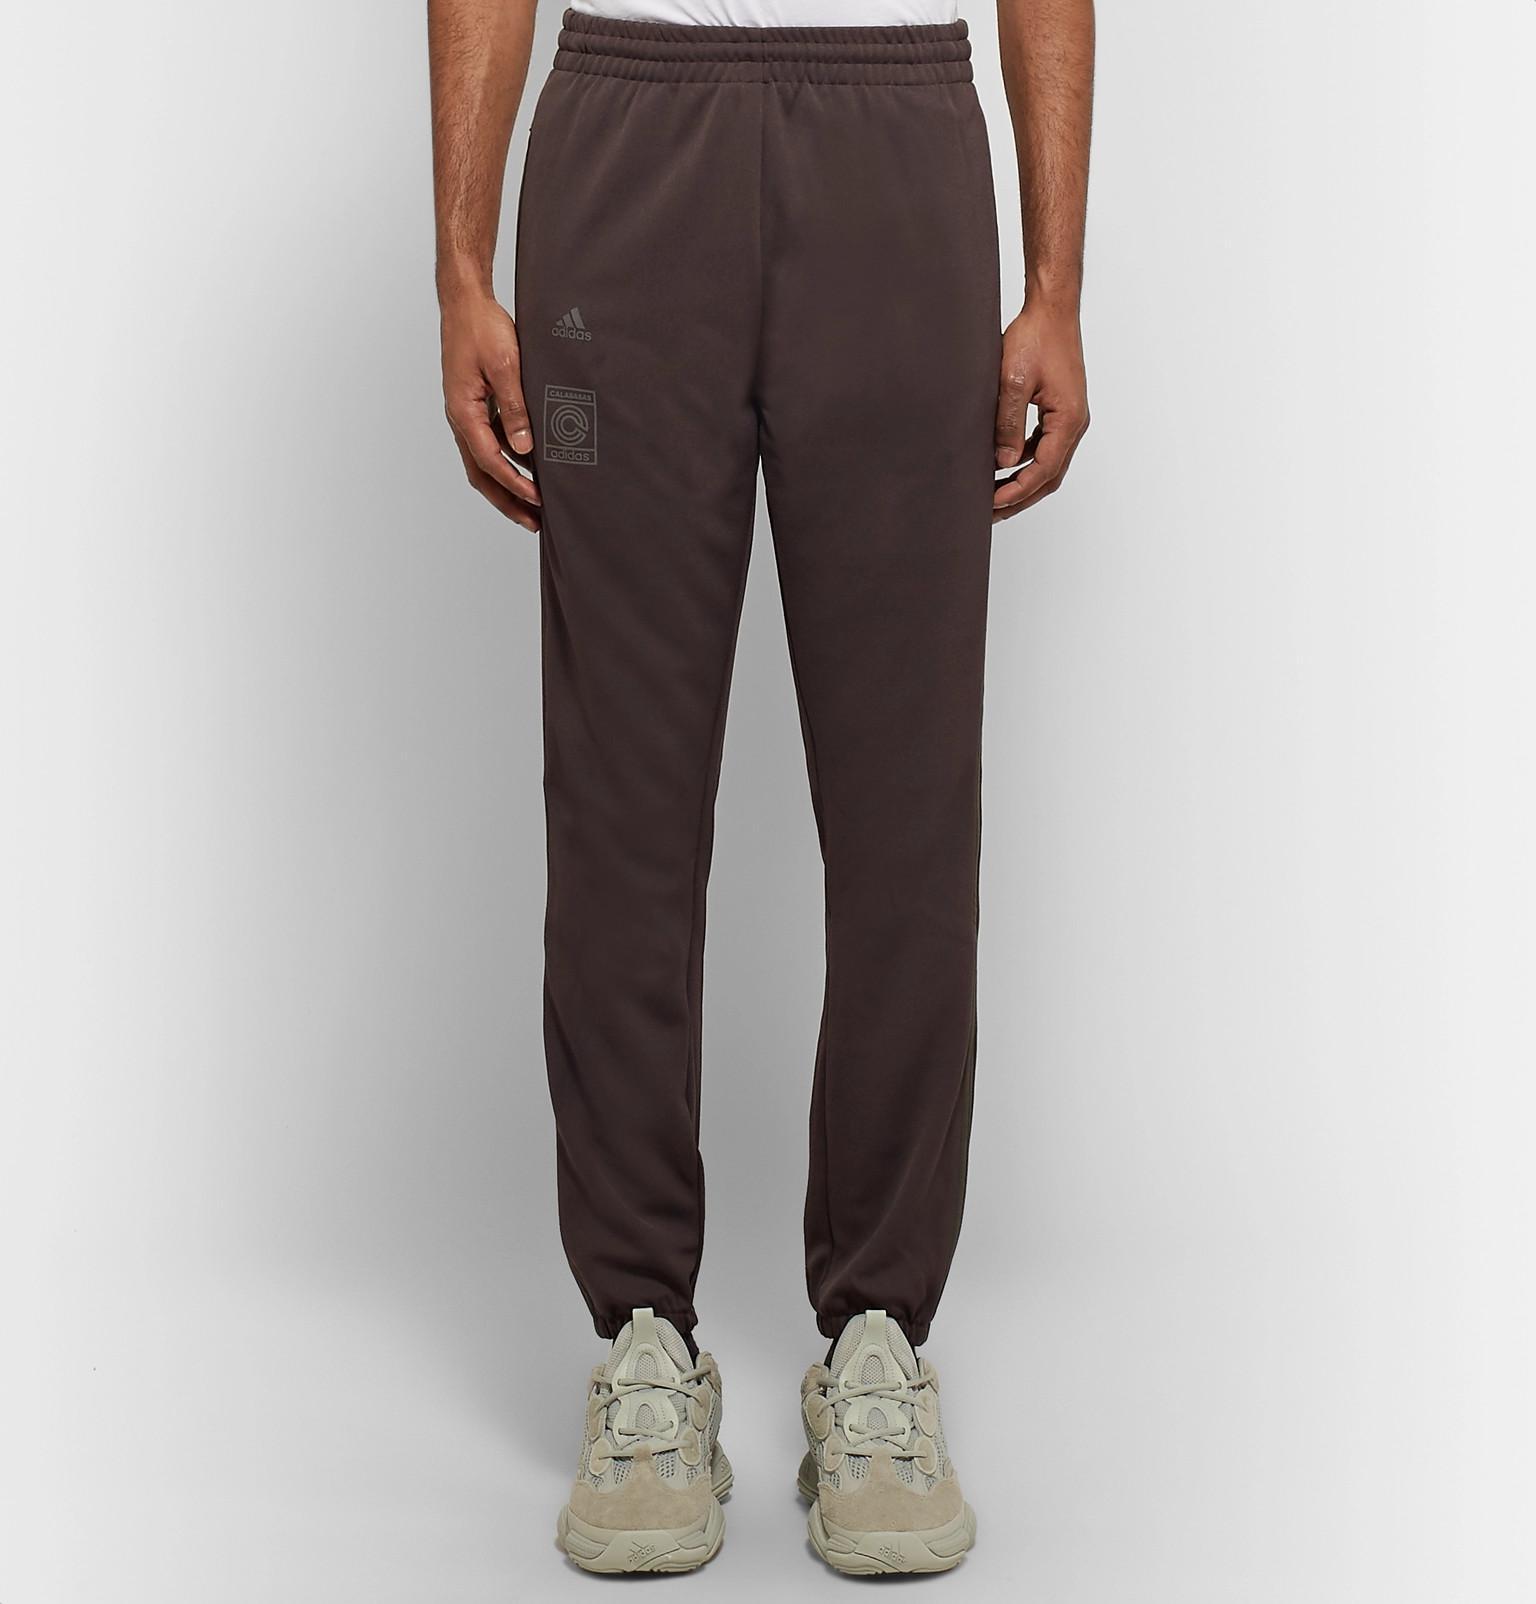 8afa9066 Adidas Originals - Brown + Yeezy Calabasas Striped Jersey Sweatpants for Men  - Lyst. View fullscreen